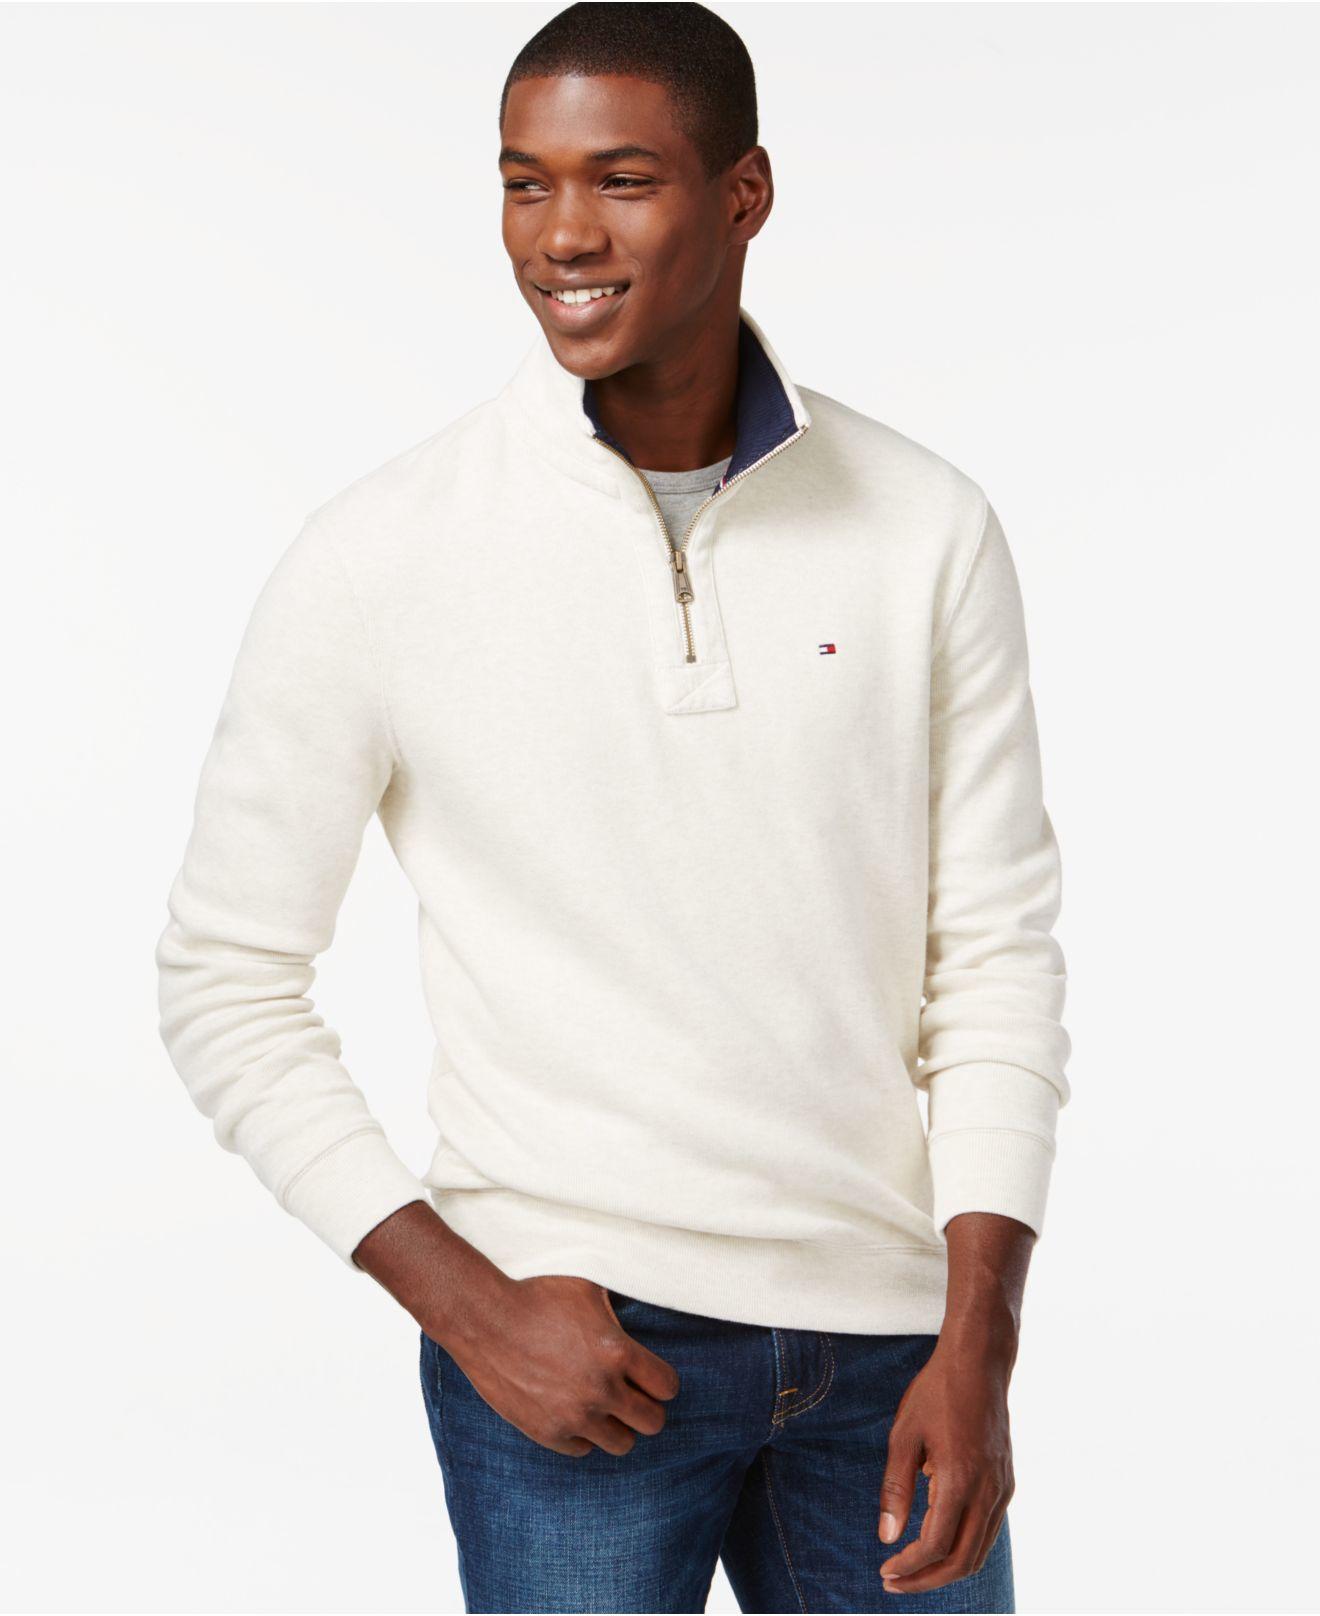 cec0c6ec3534f Lyst - Tommy Hilfiger French Rib Quarter-zip Mock-collar Sweater in ...